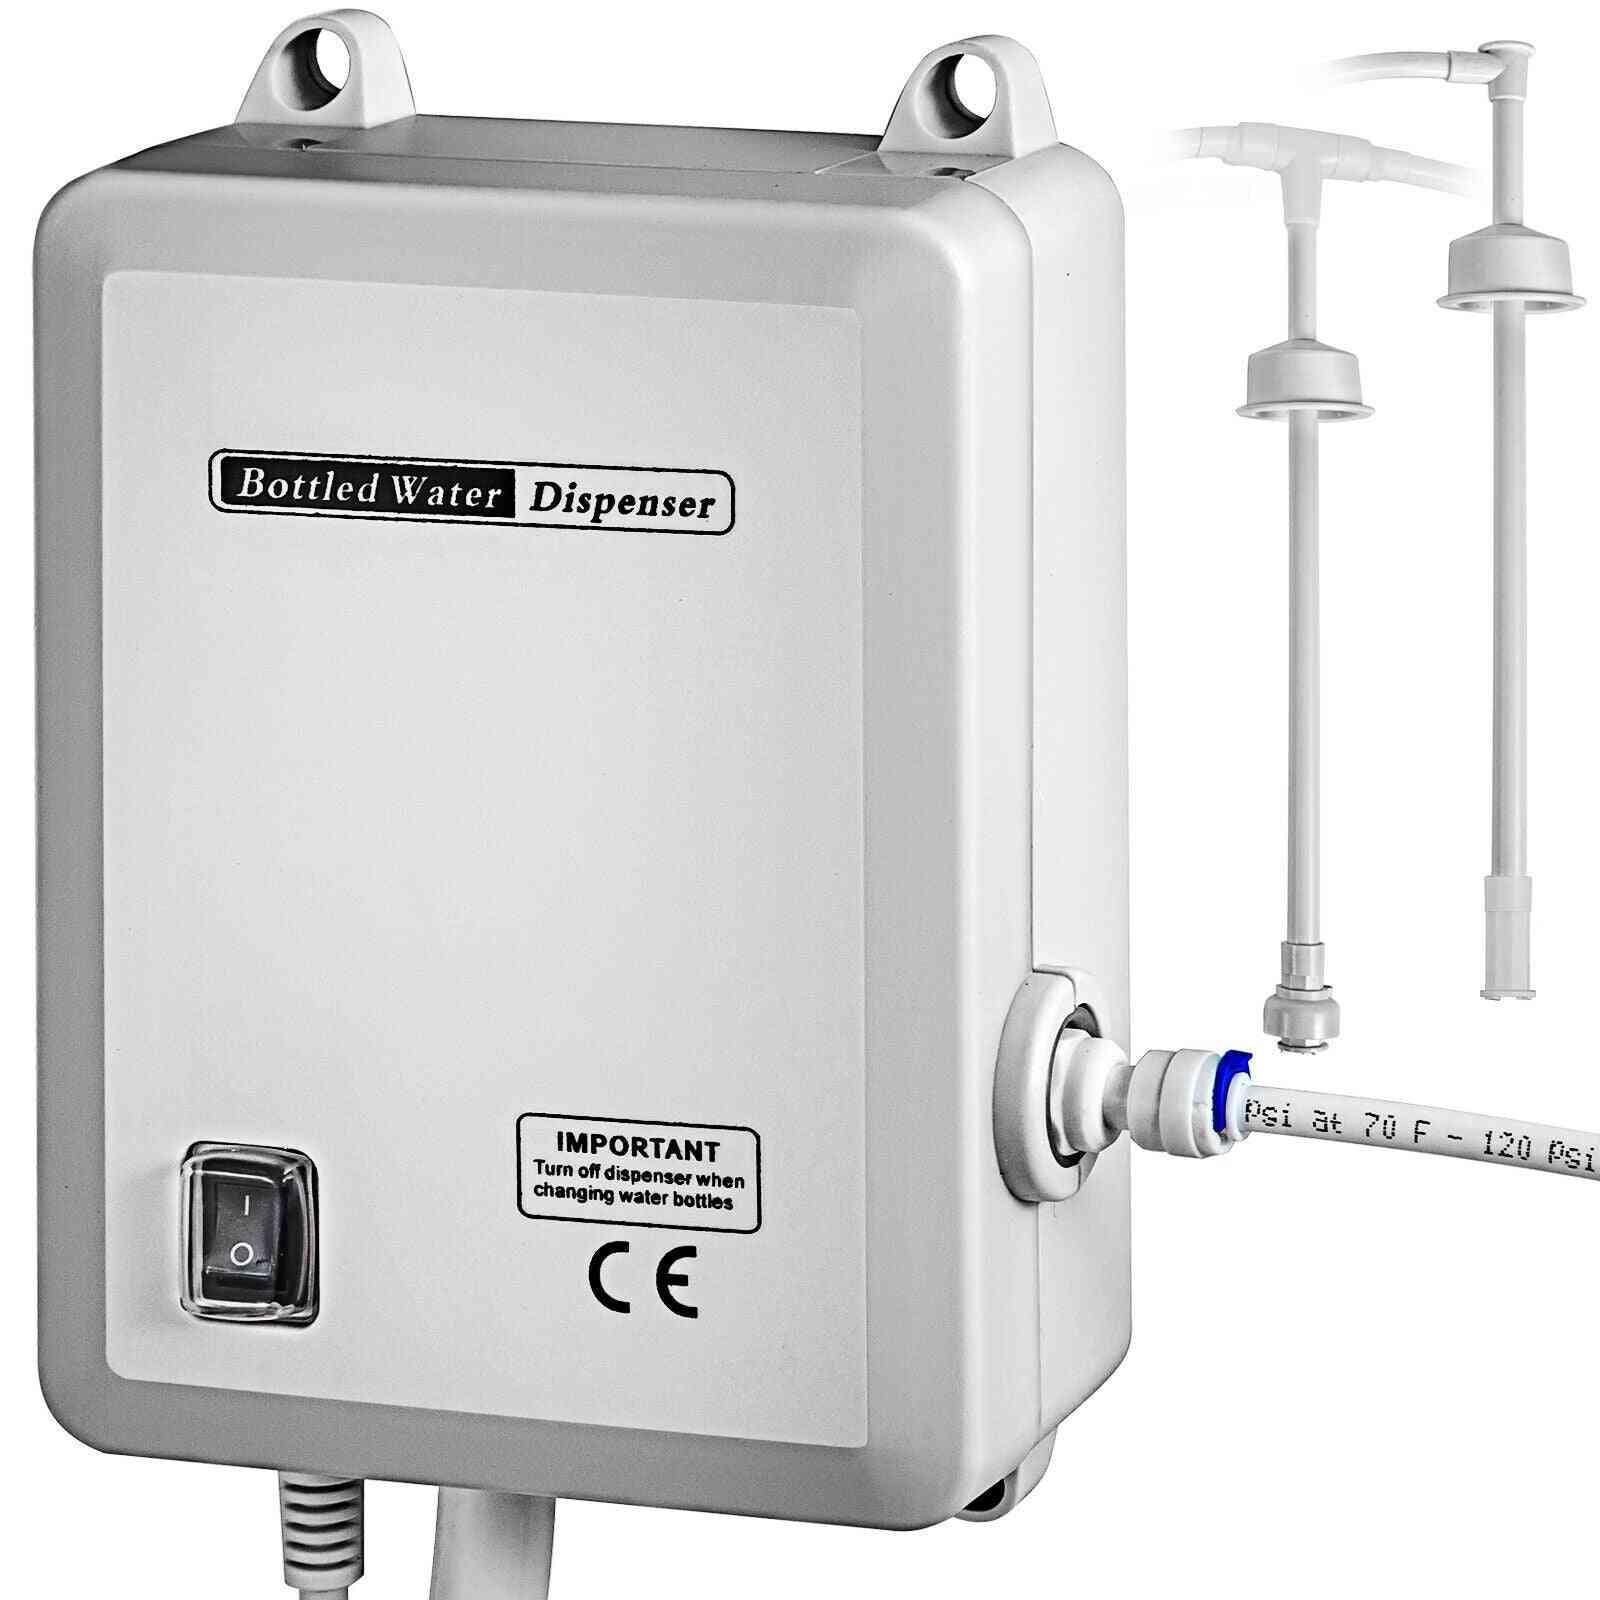 Water Bottle Dispenser Pump System